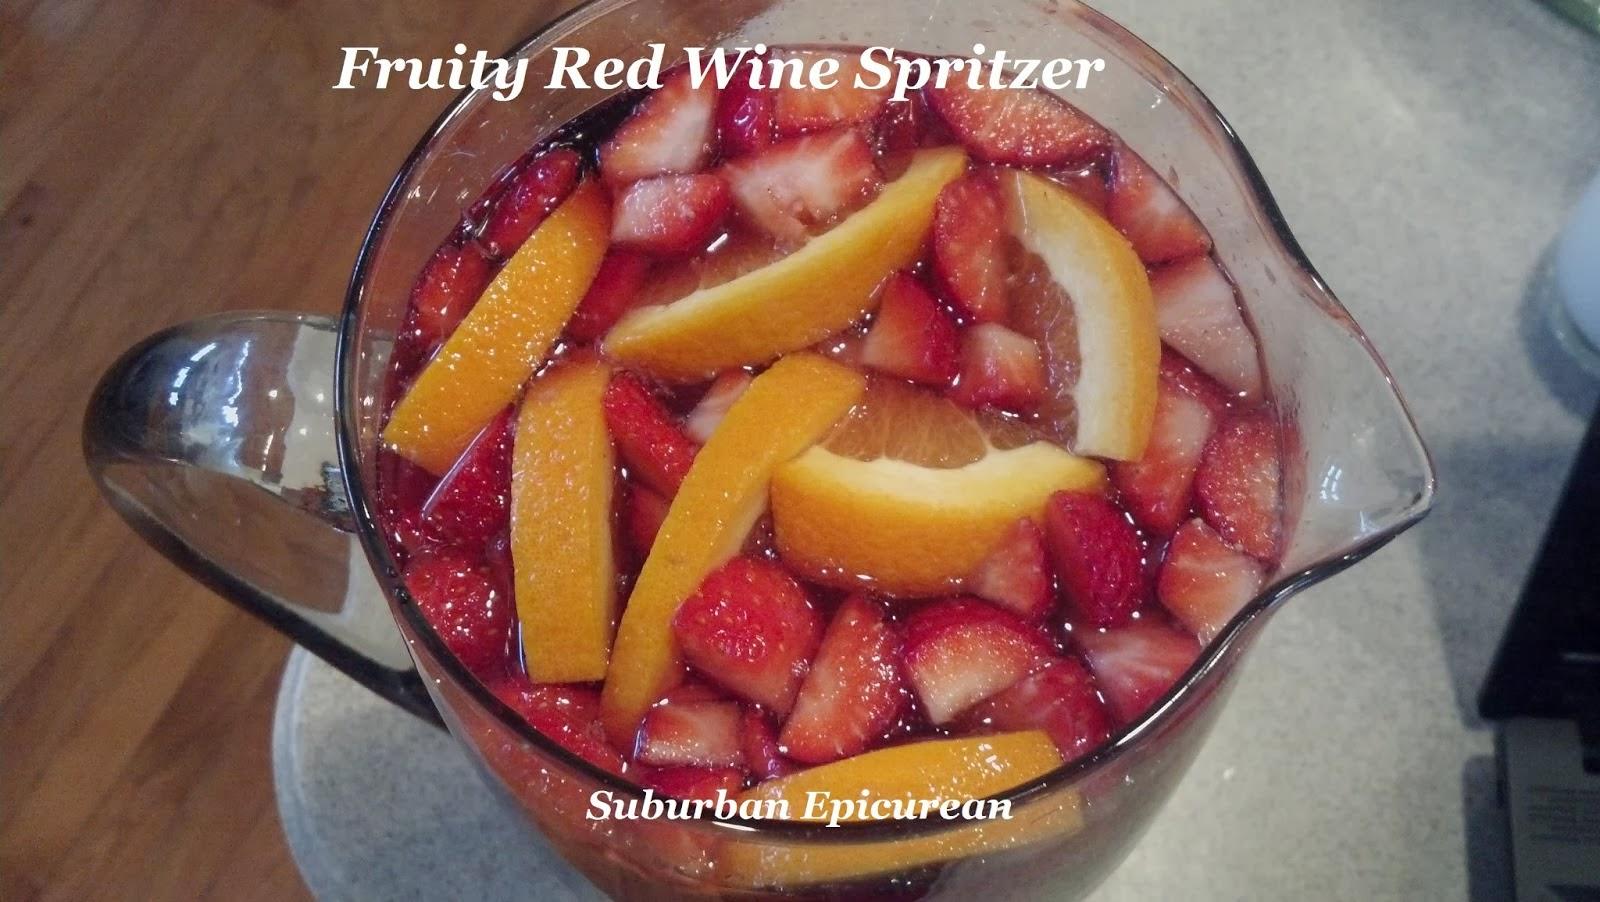 http://suburbanepicurean.blogspot.com/2013/03/fruity-red-wine-spritzer.html